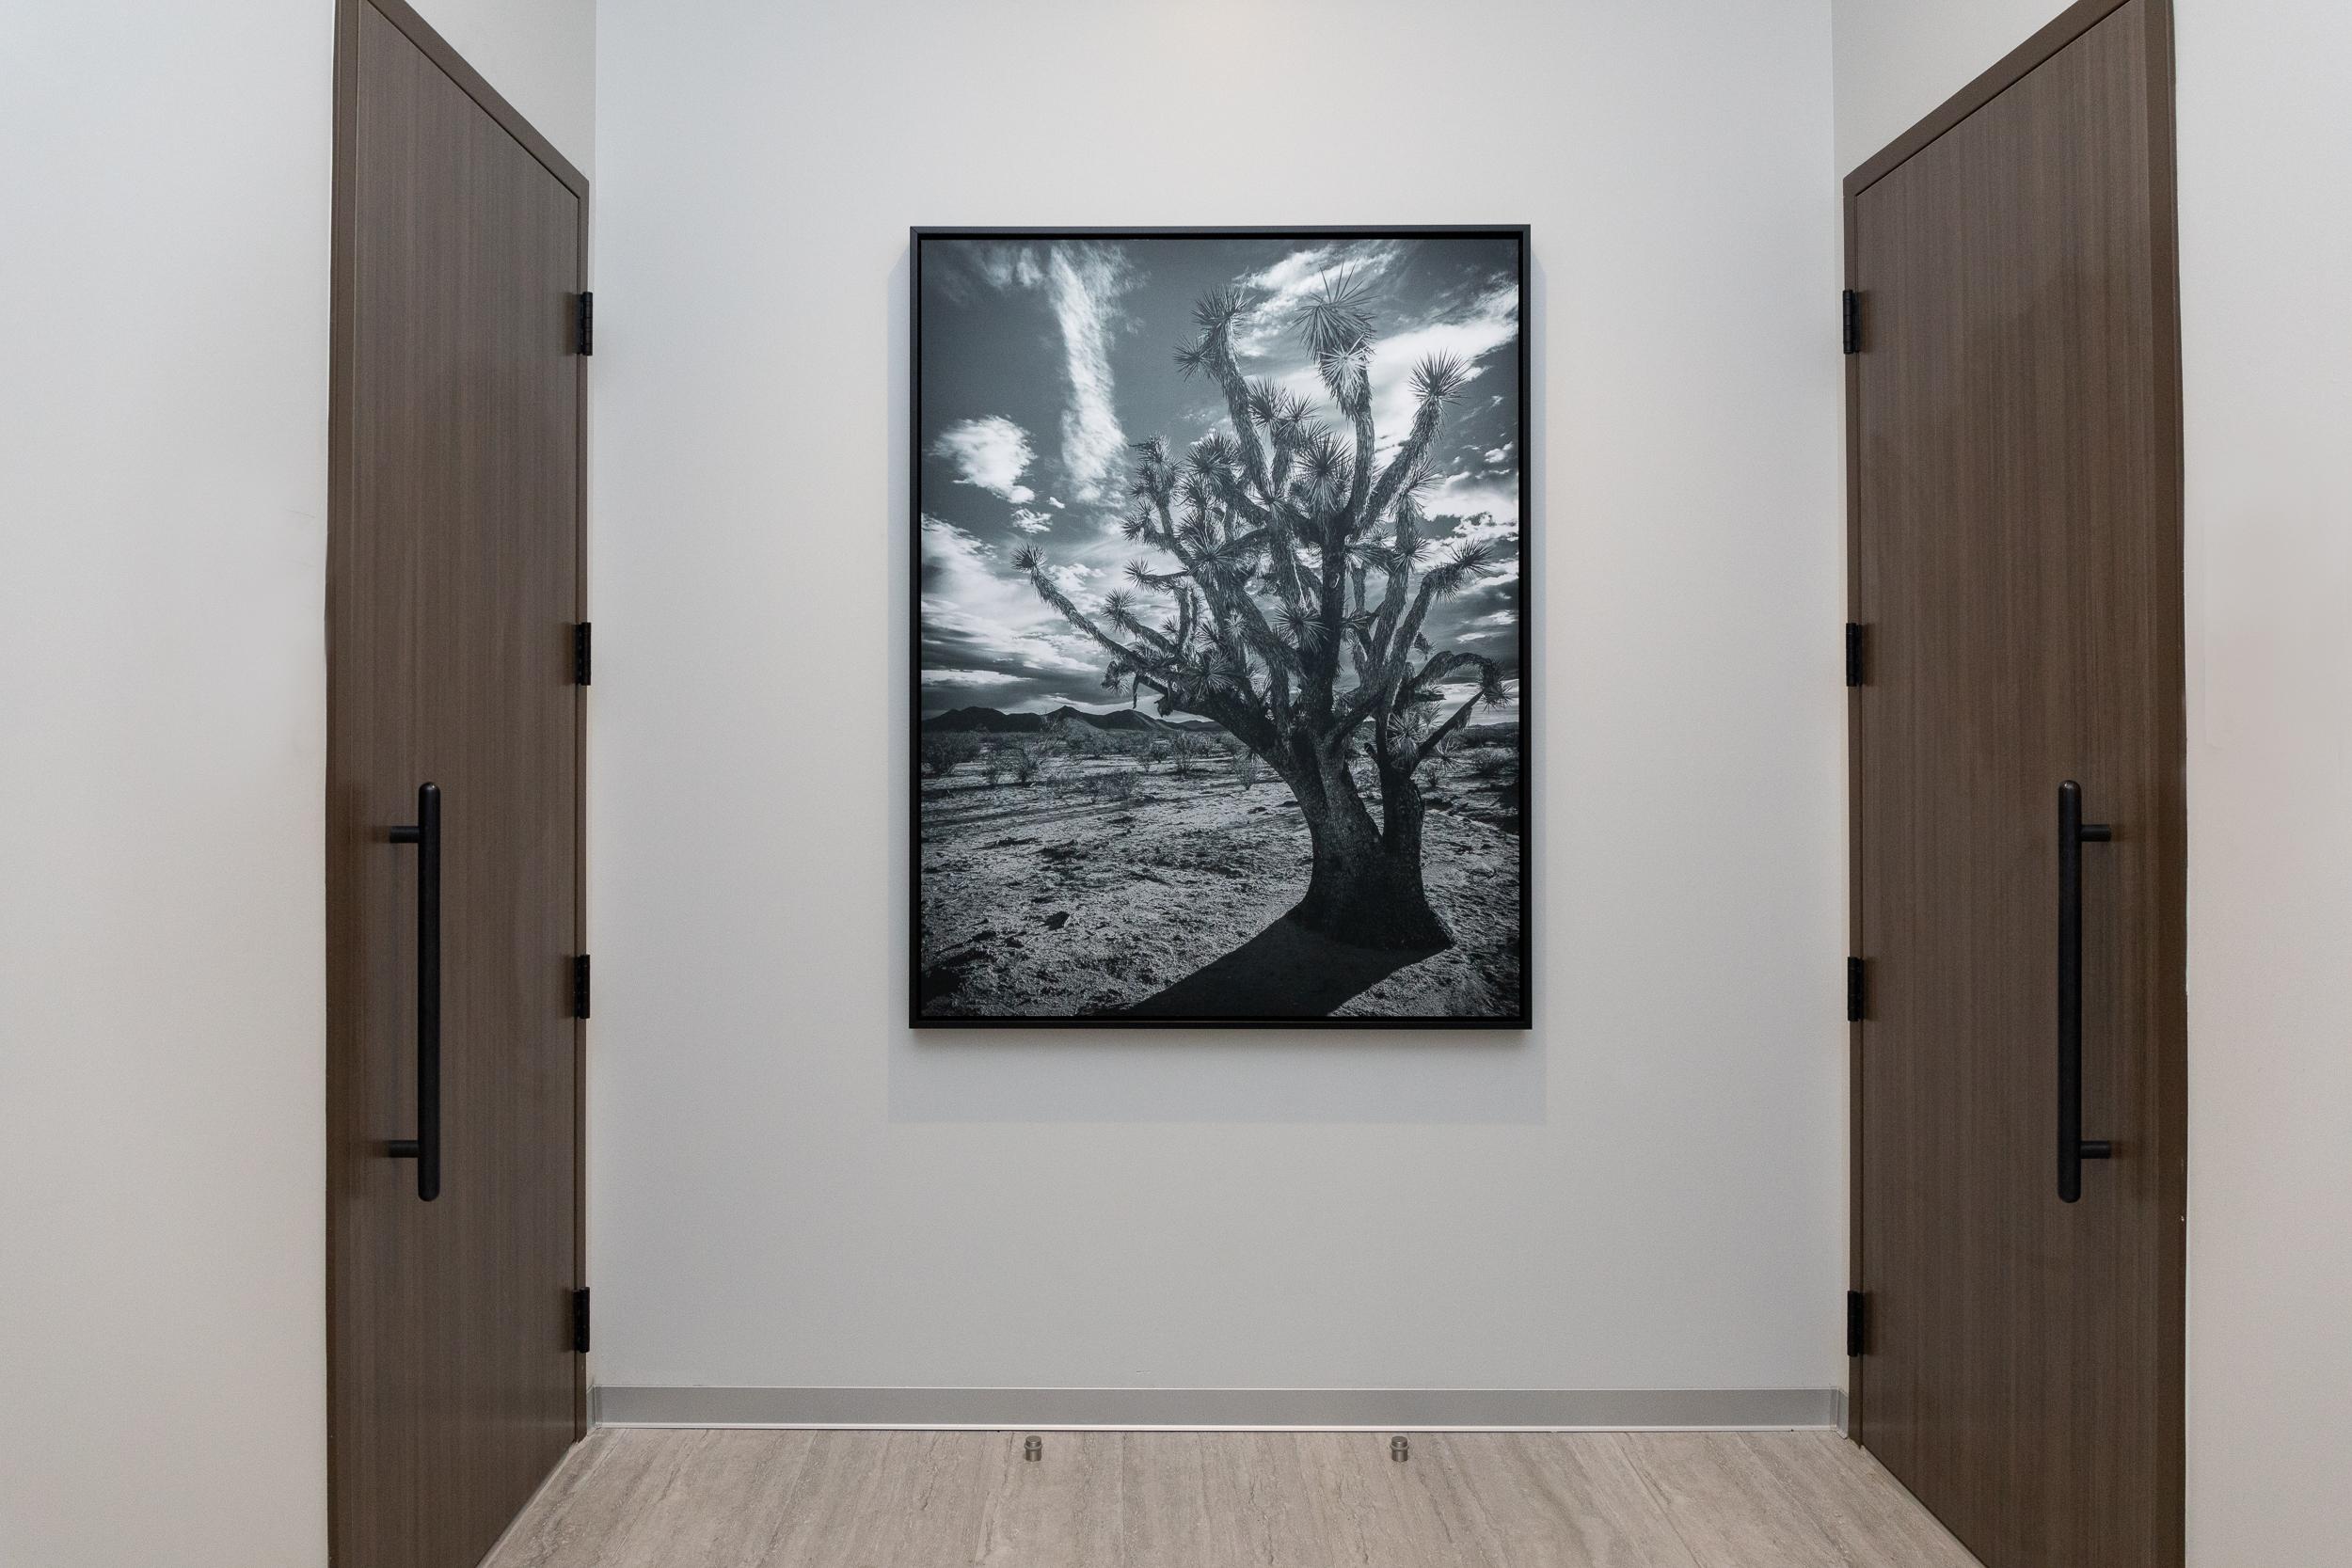 4' x 5' Photograph of US-93 on Metallic Paper by Jon Linton